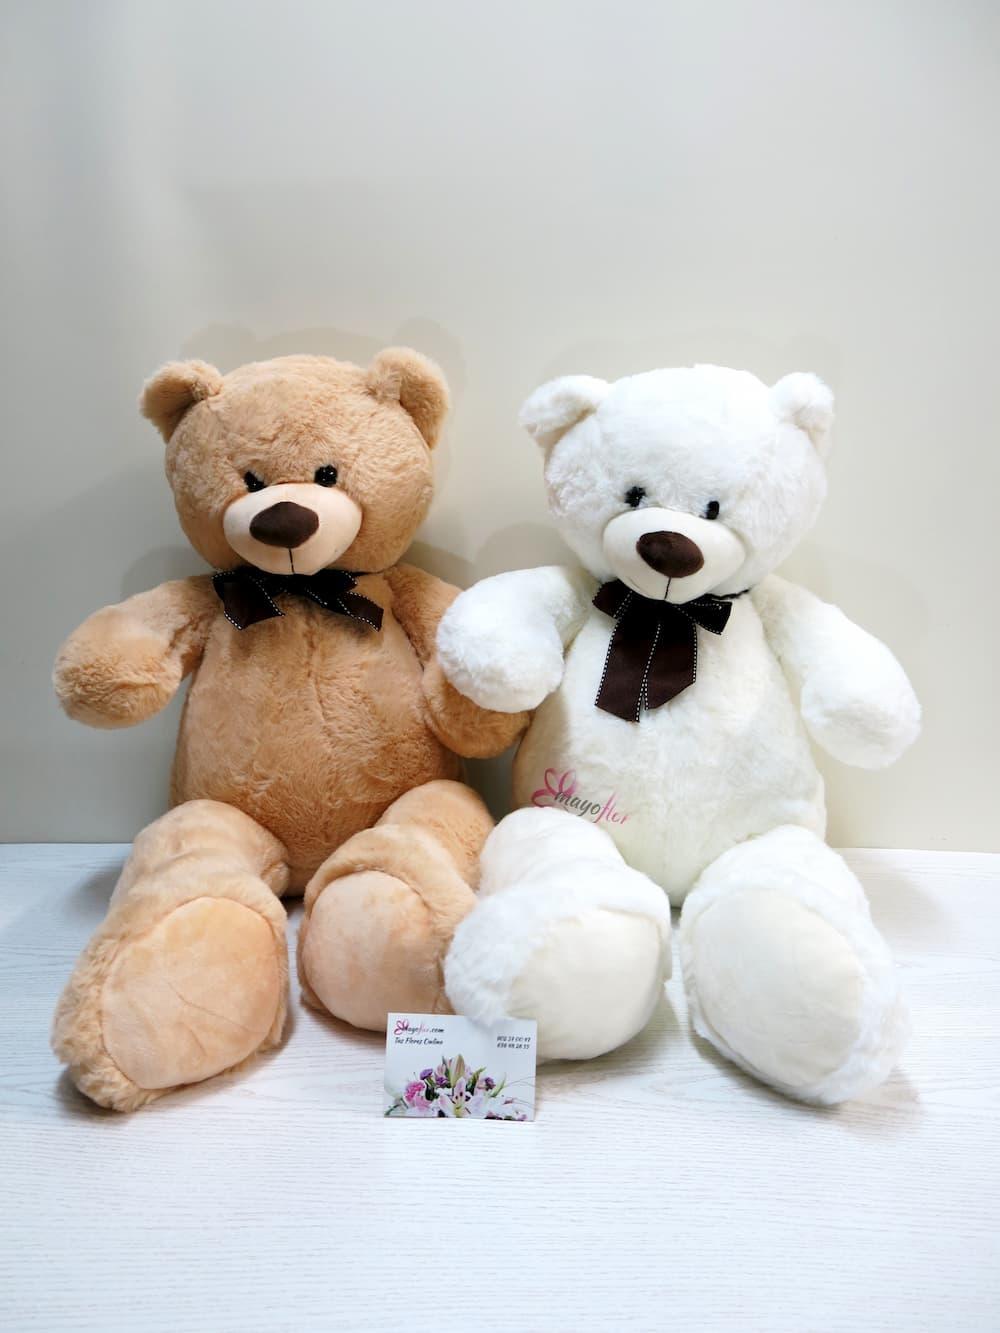 Big teddy bear. 60x35 cm approx. - Foto principal